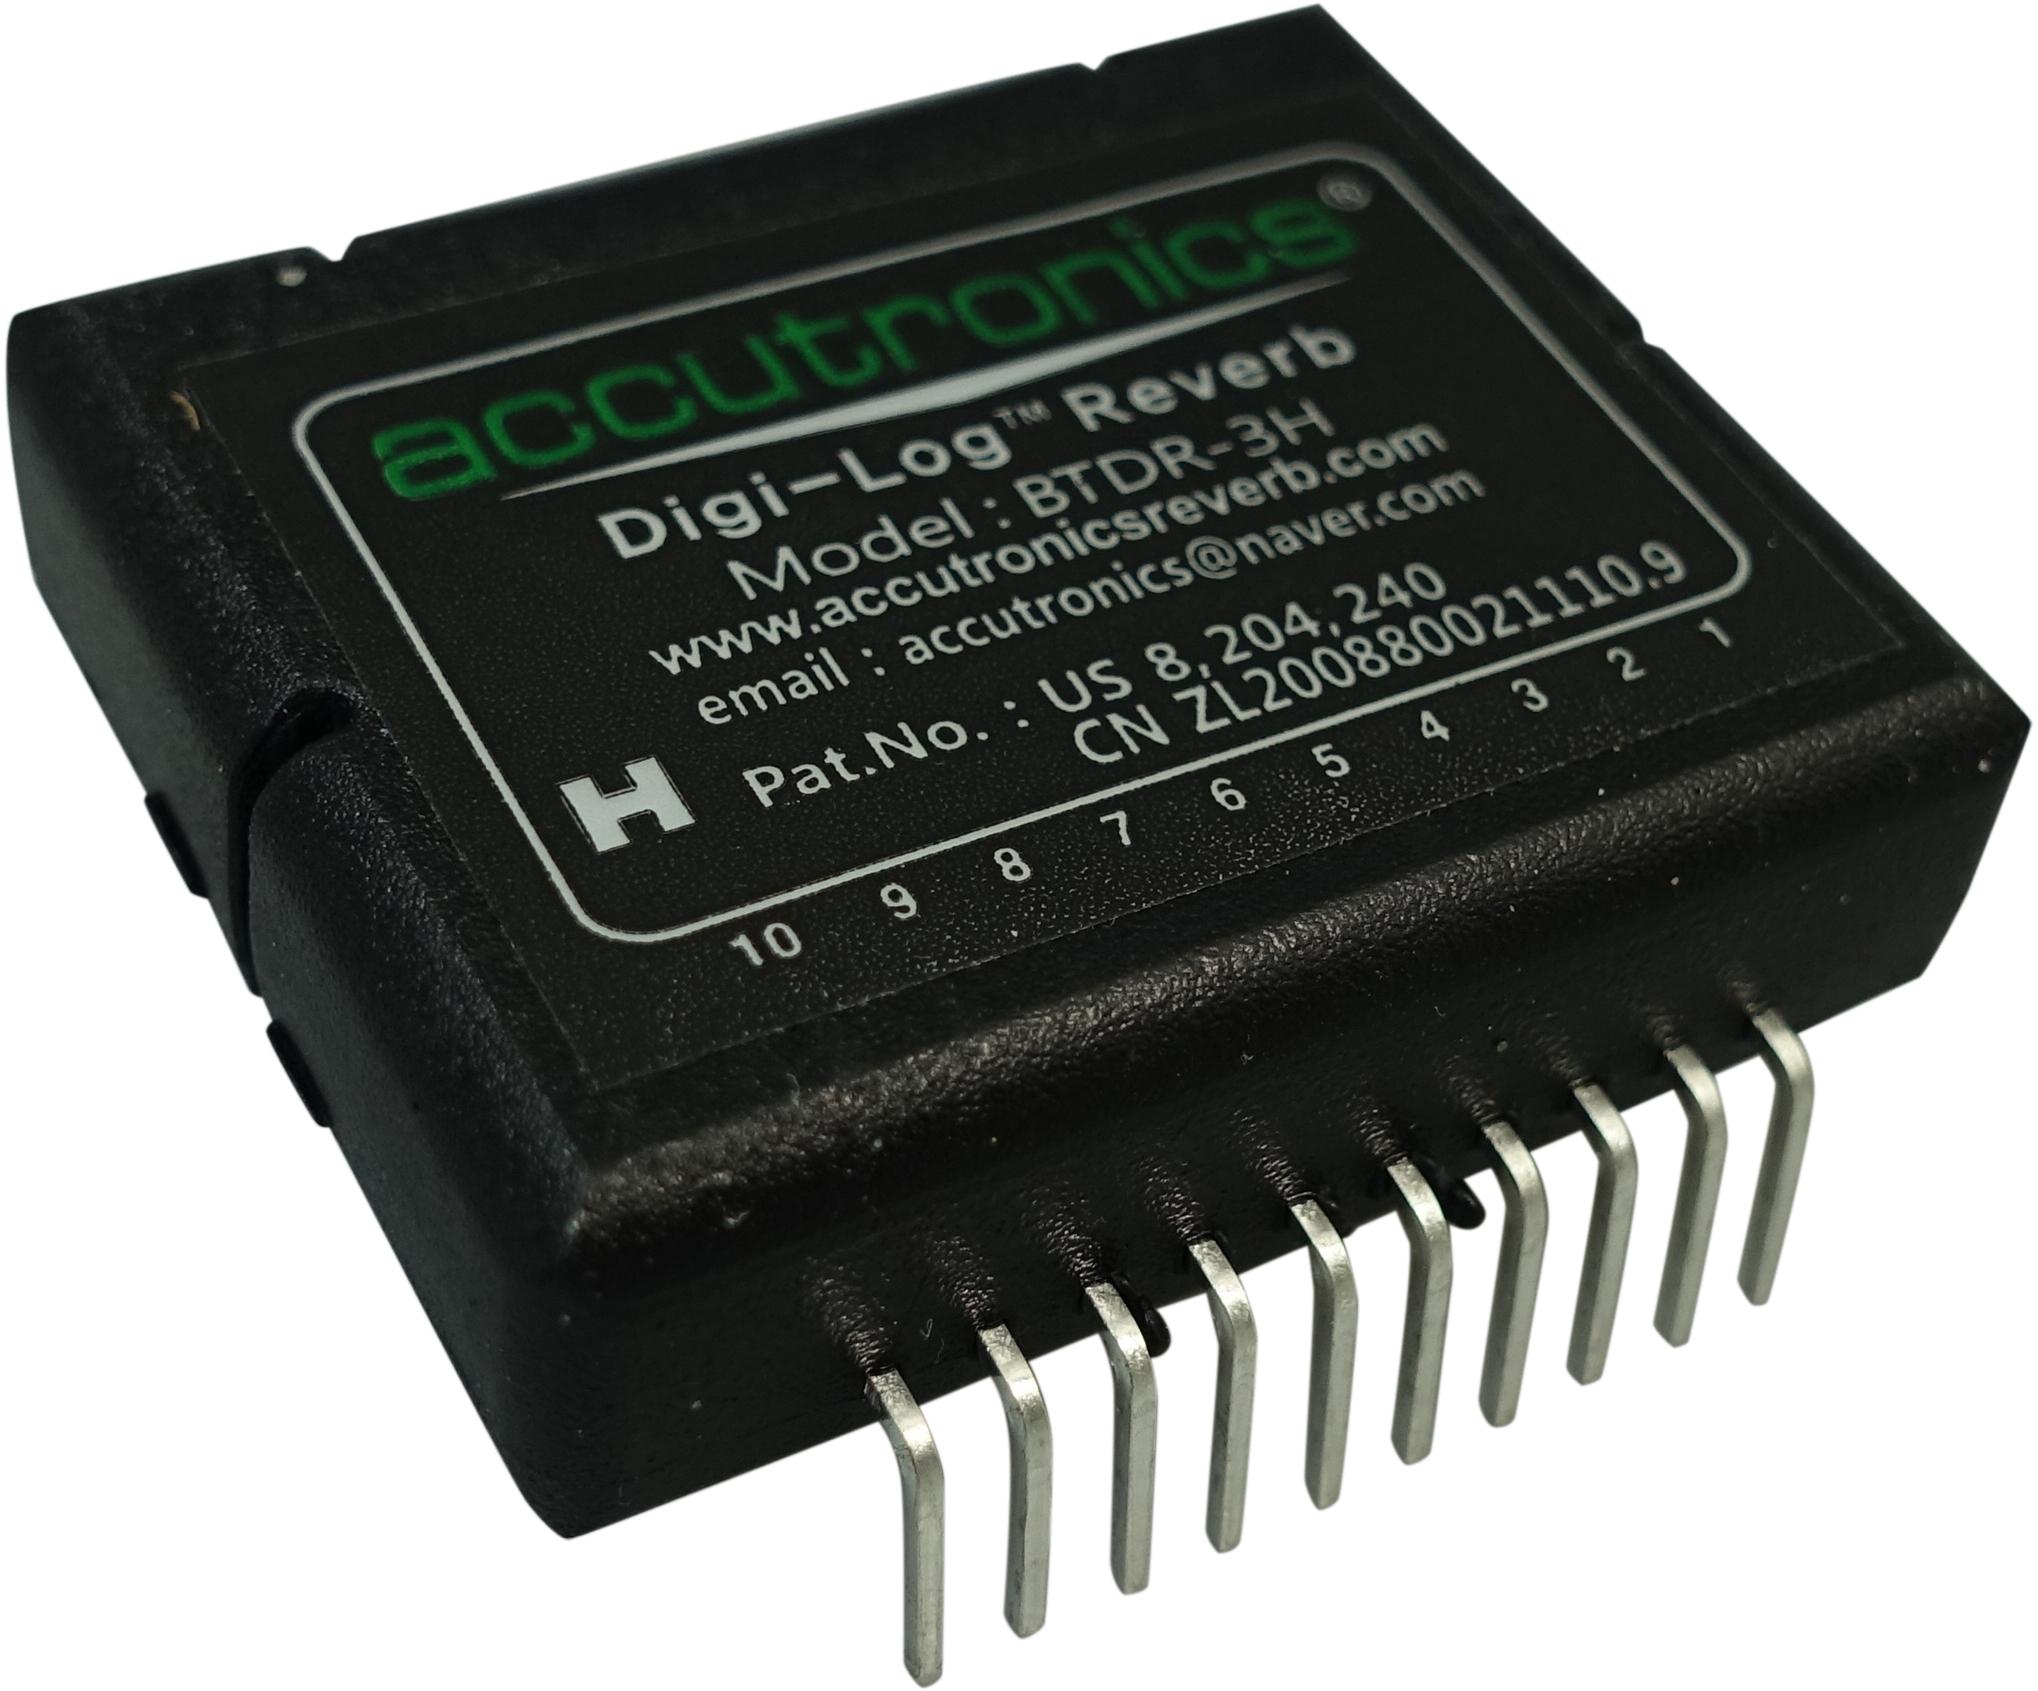 Accutronics Digi-Log BTDR-3H